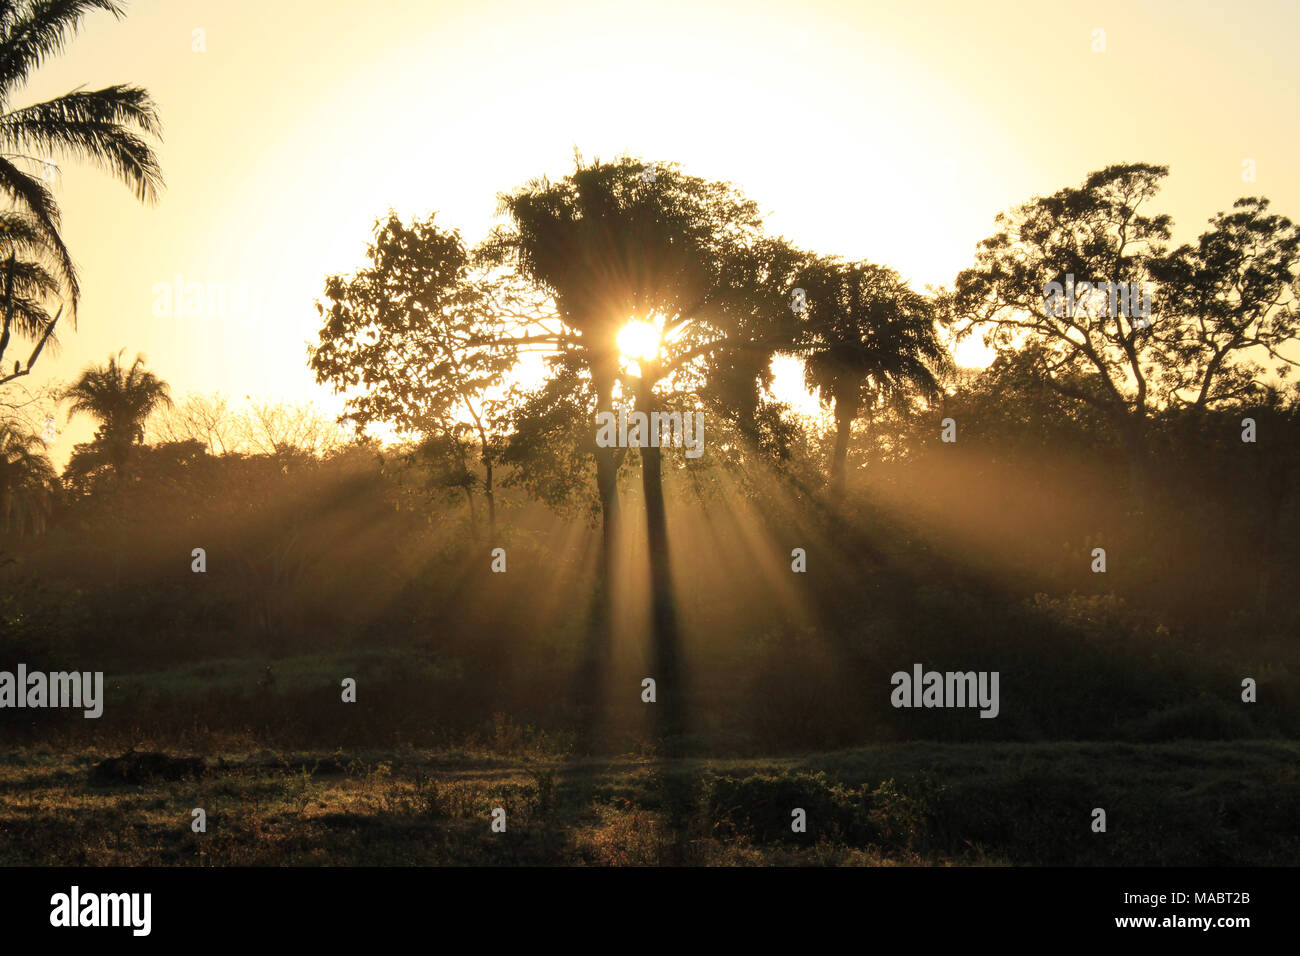 Sunburst, daybreak, sunrise, sun rays, sunburst behind tree, nature photography, nature, wilderness, Pantanal, Brazil, Mato Grosso, South America, - Stock Image